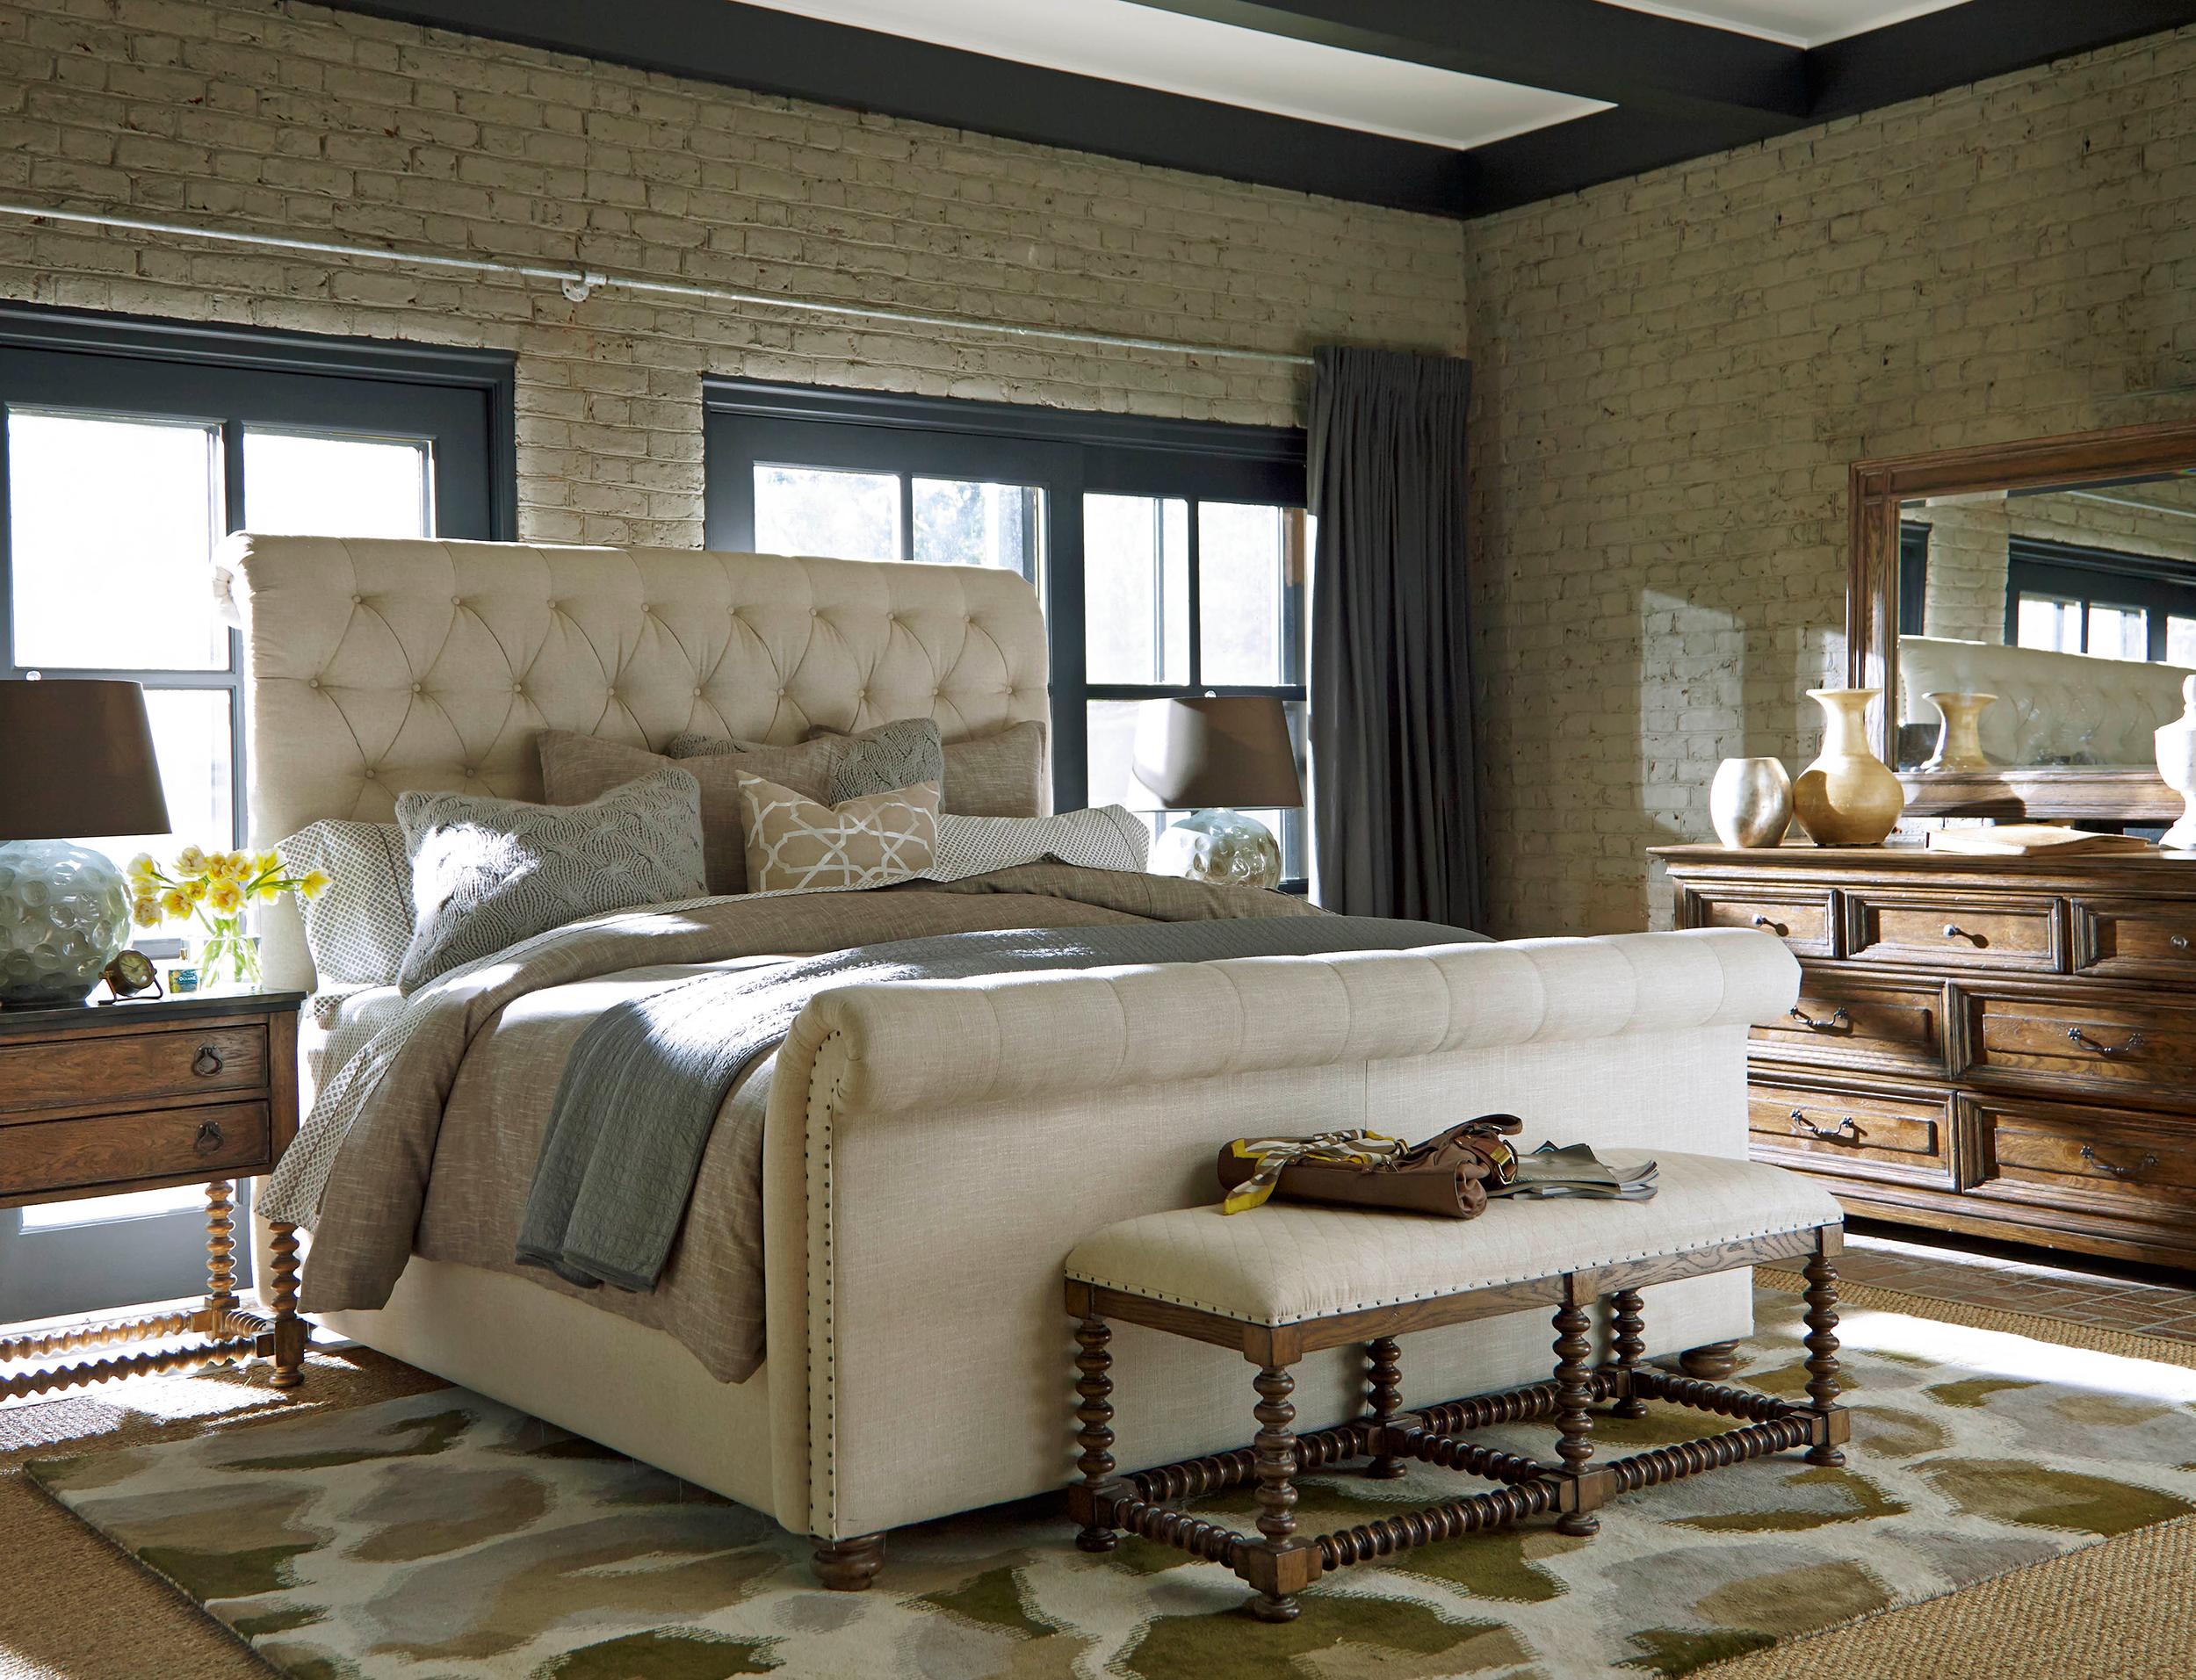 Universal-bedroom-(2).jpg